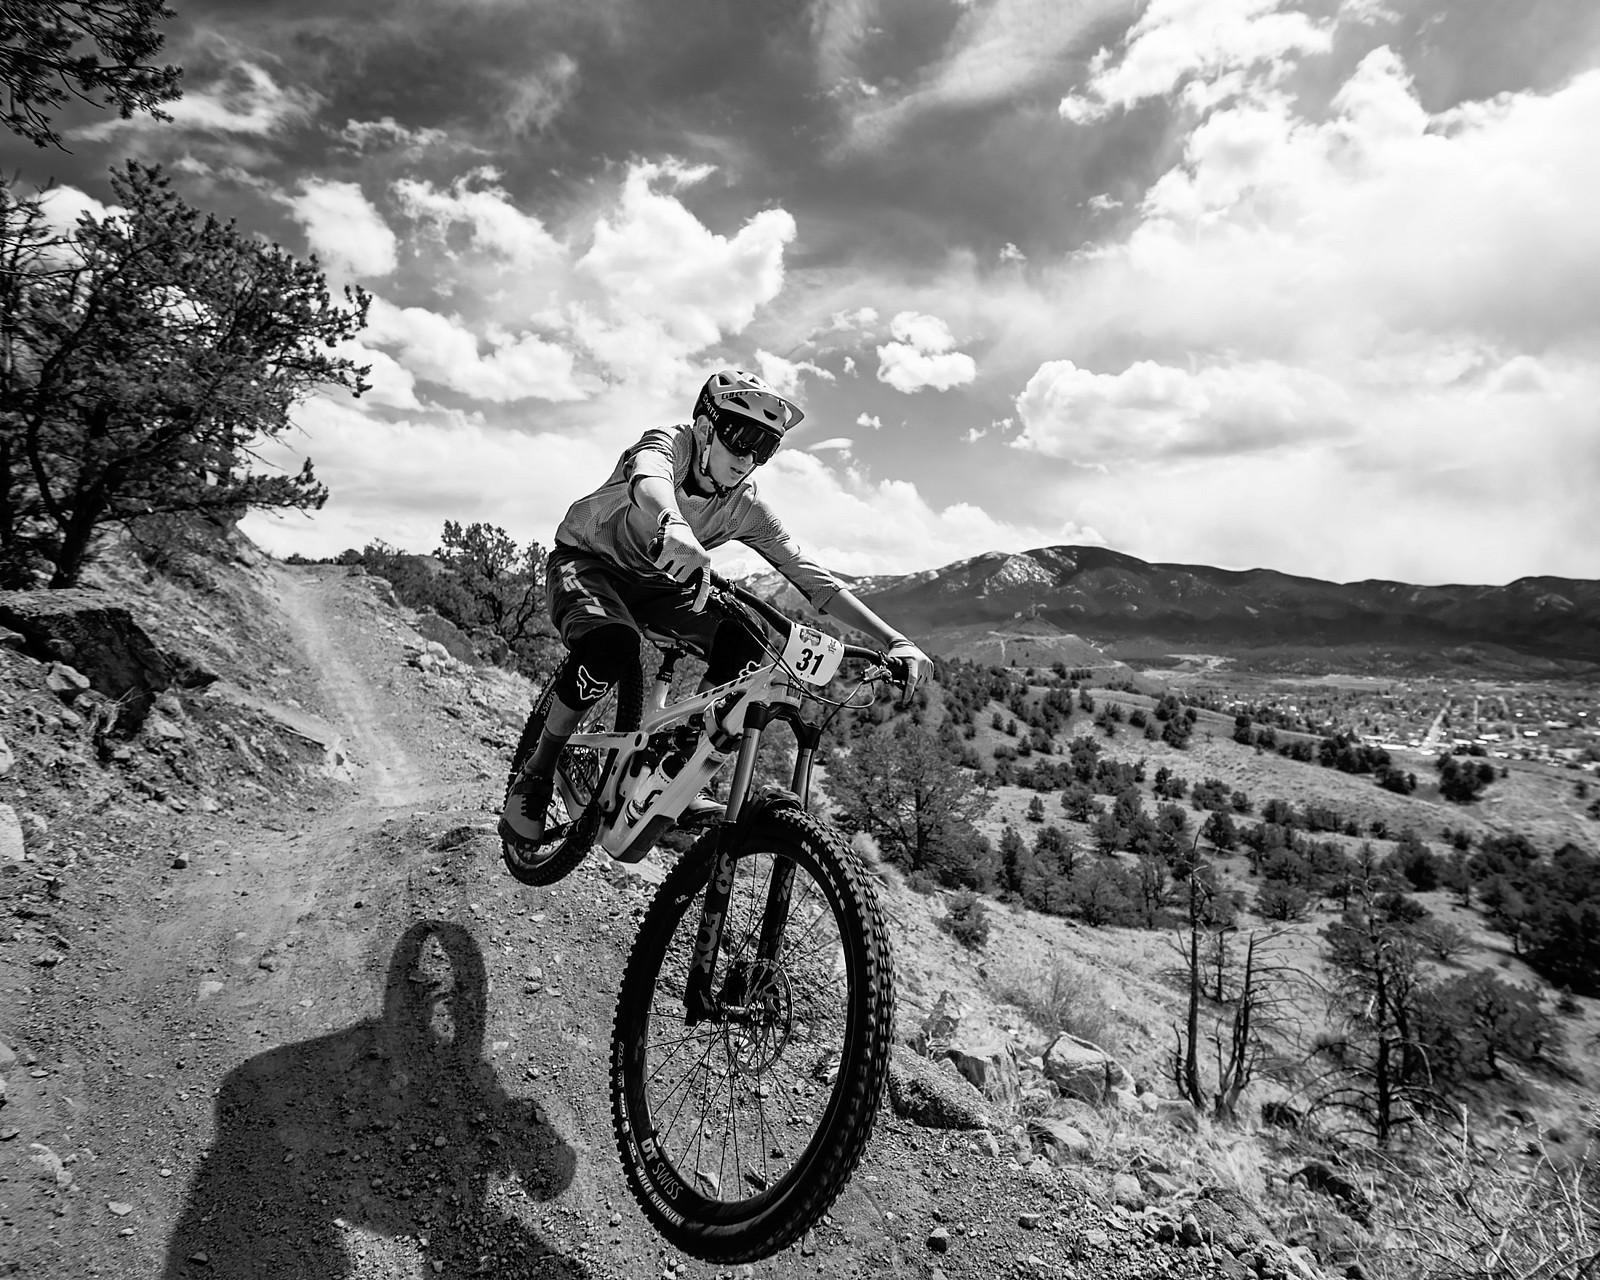 850 8105 - Curtis Gillen - Mountain Biking Pictures - Vital MTB